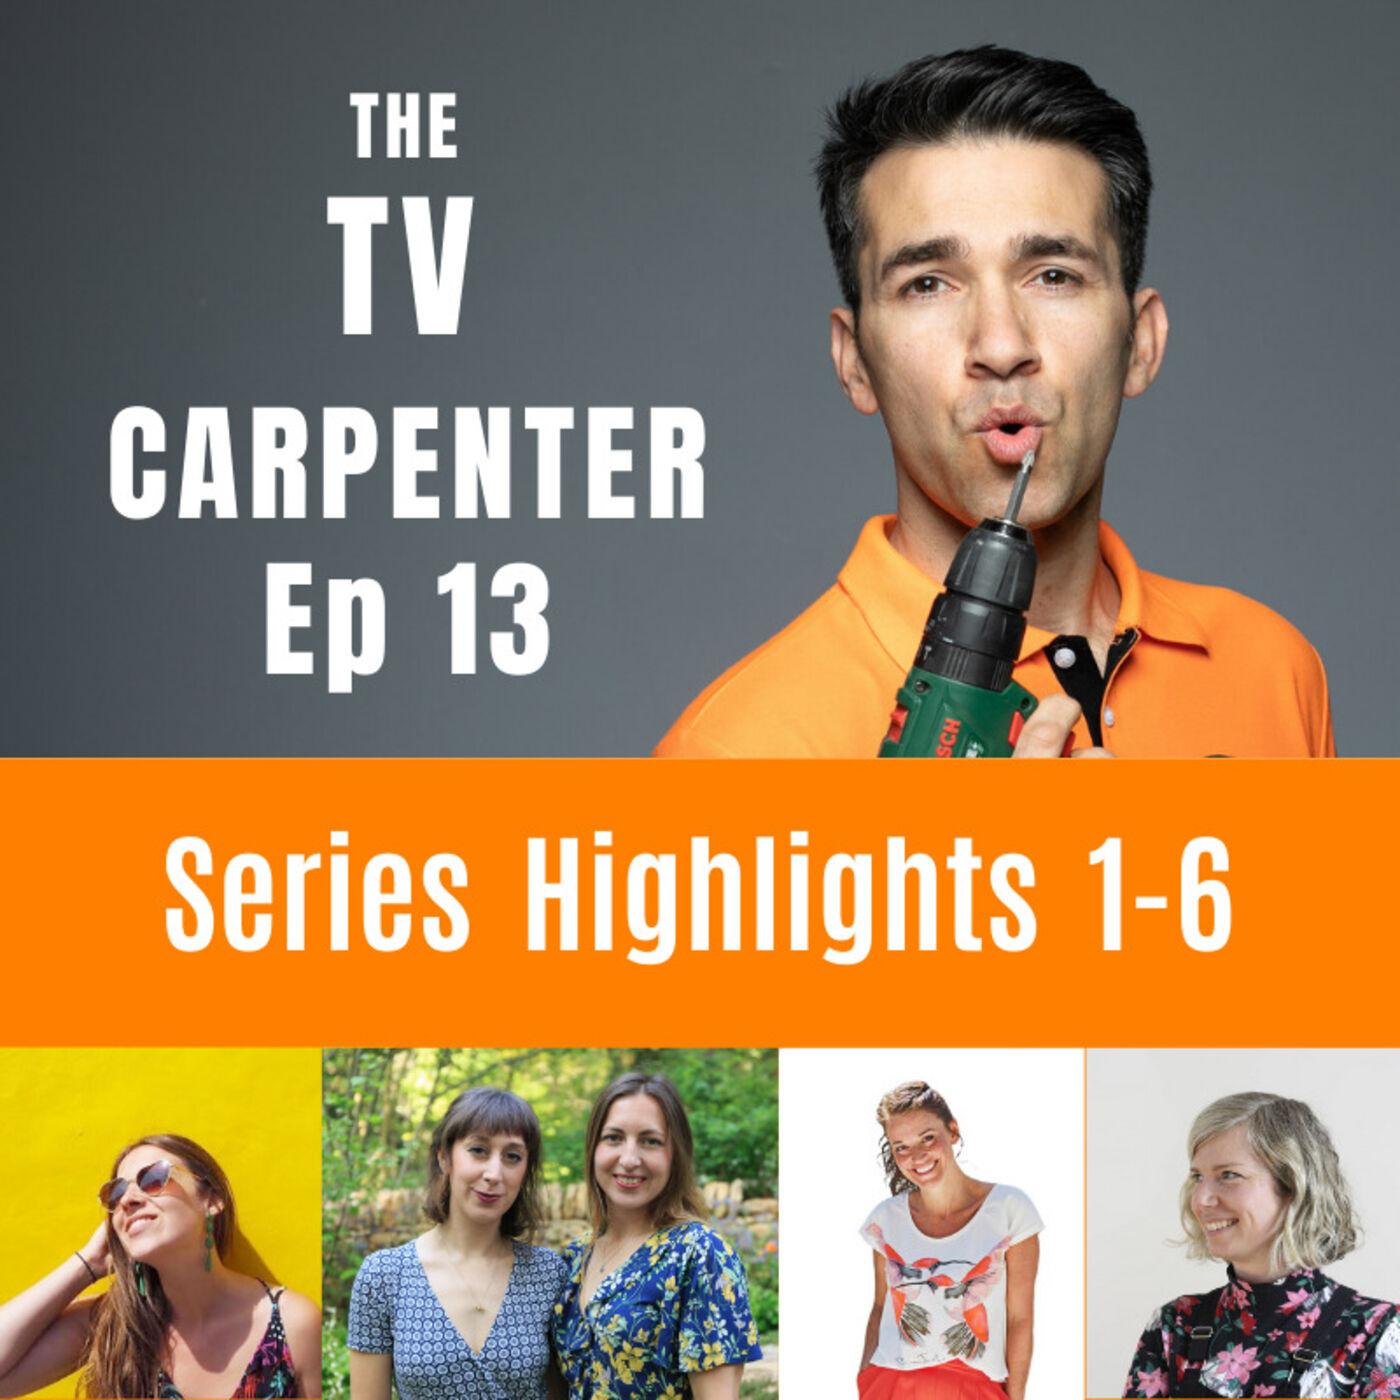 Series Highlights 1-6 TV Carpenter